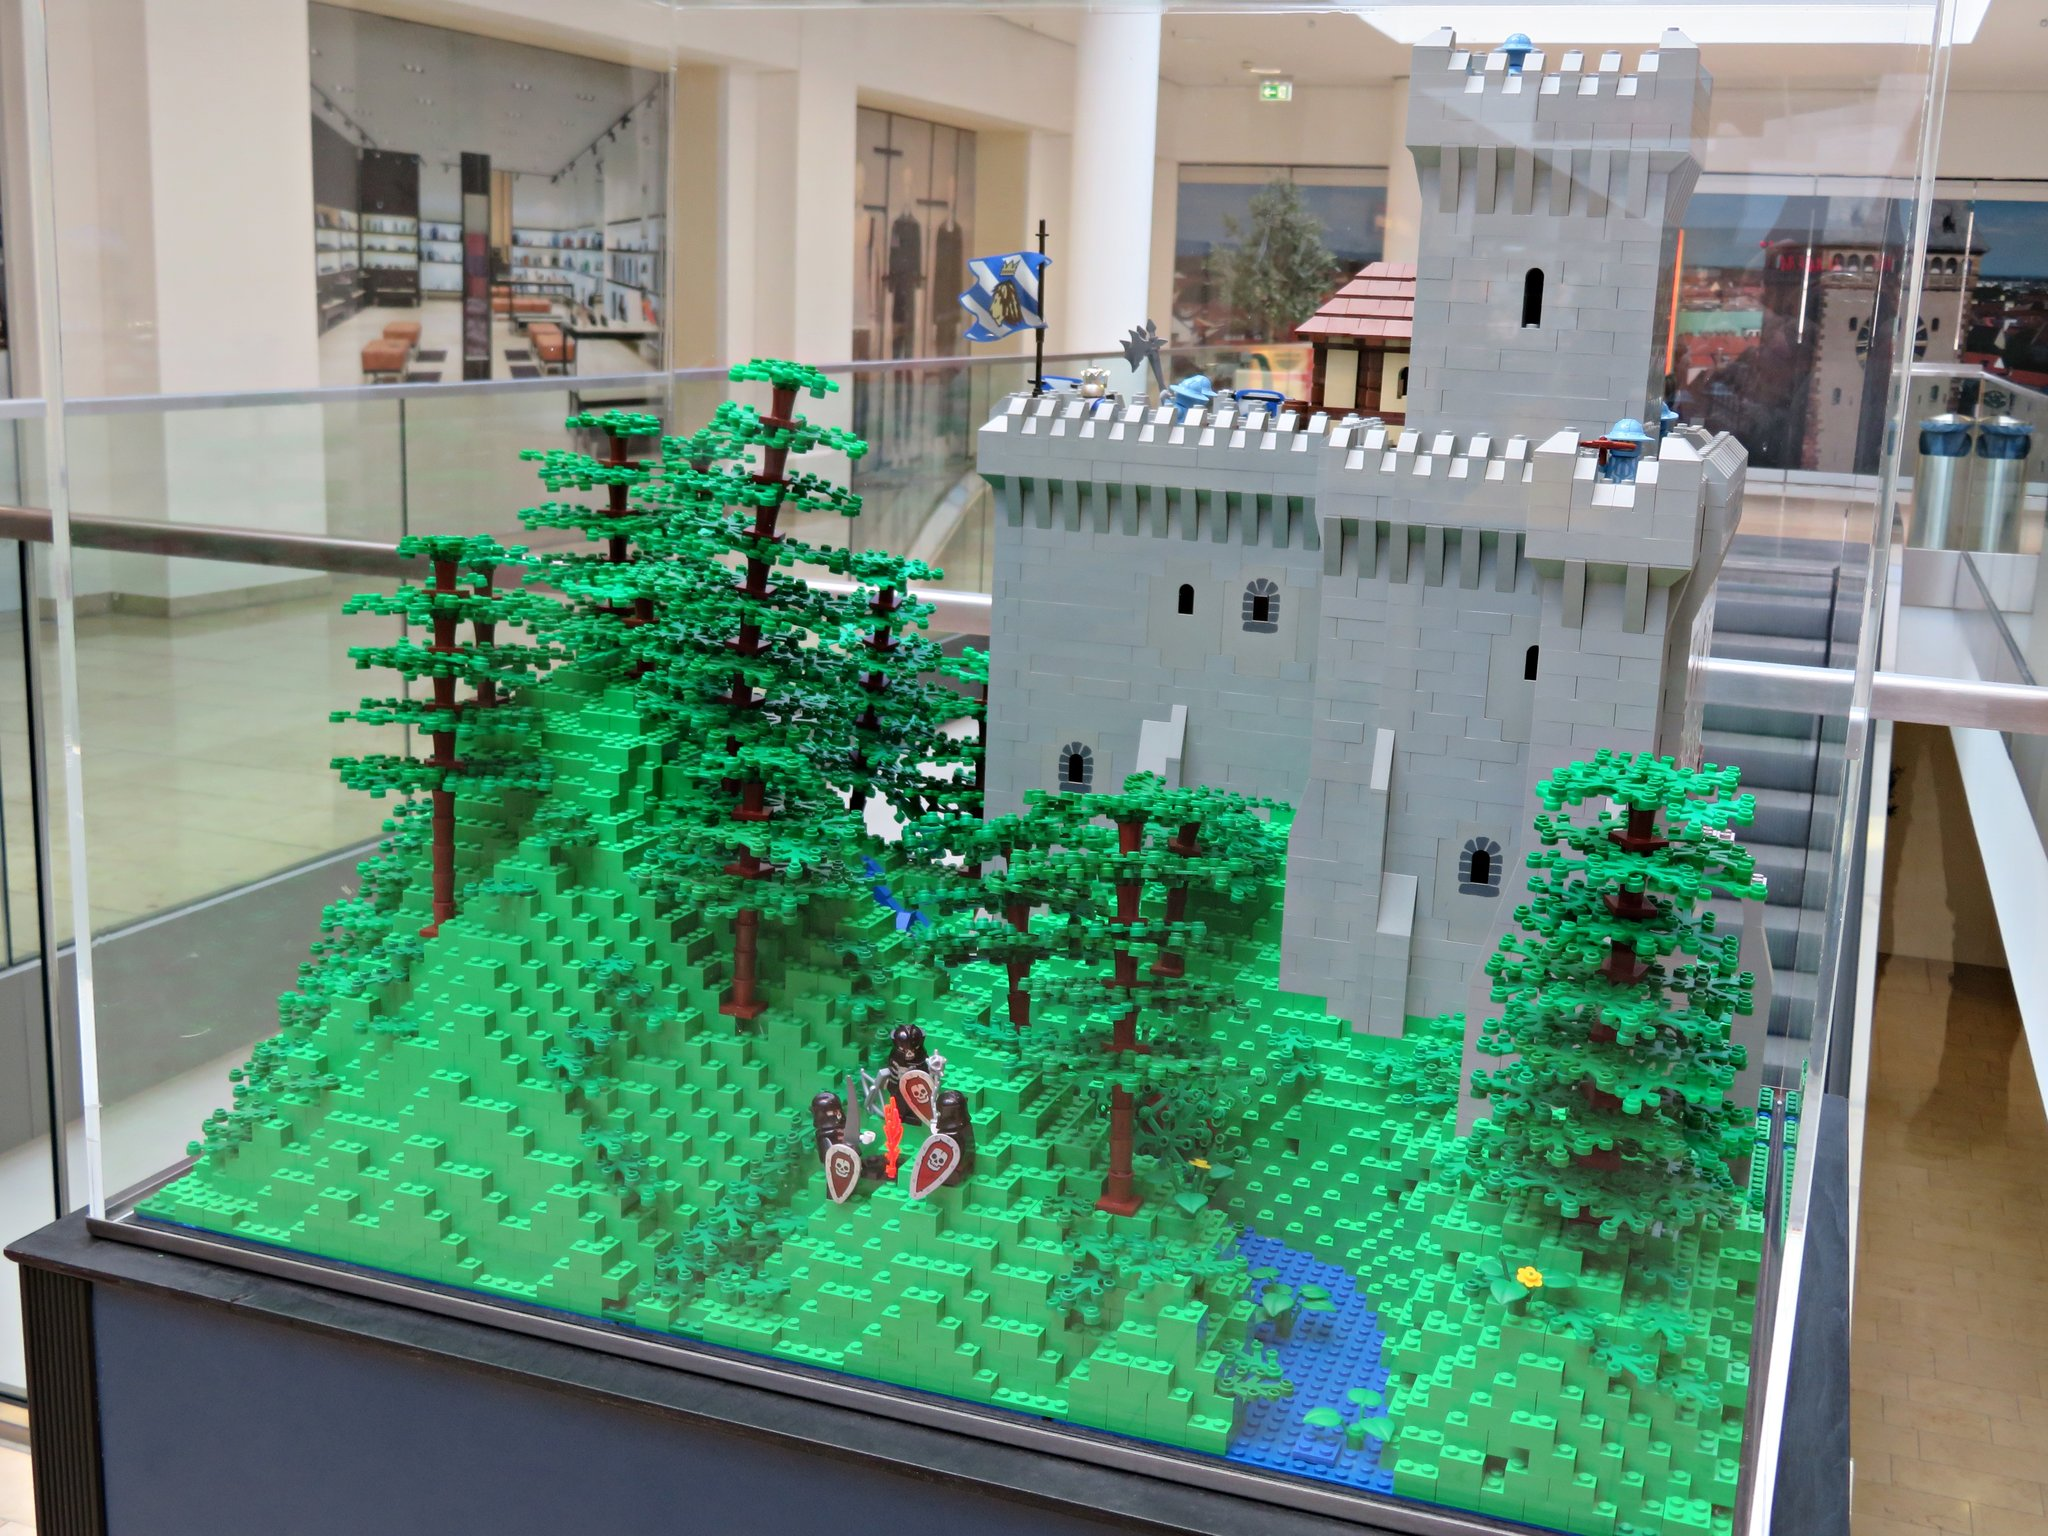 Lego Mobel Selber Bauen </div>                                   </div> </div>       </div>                      </div> <div class=